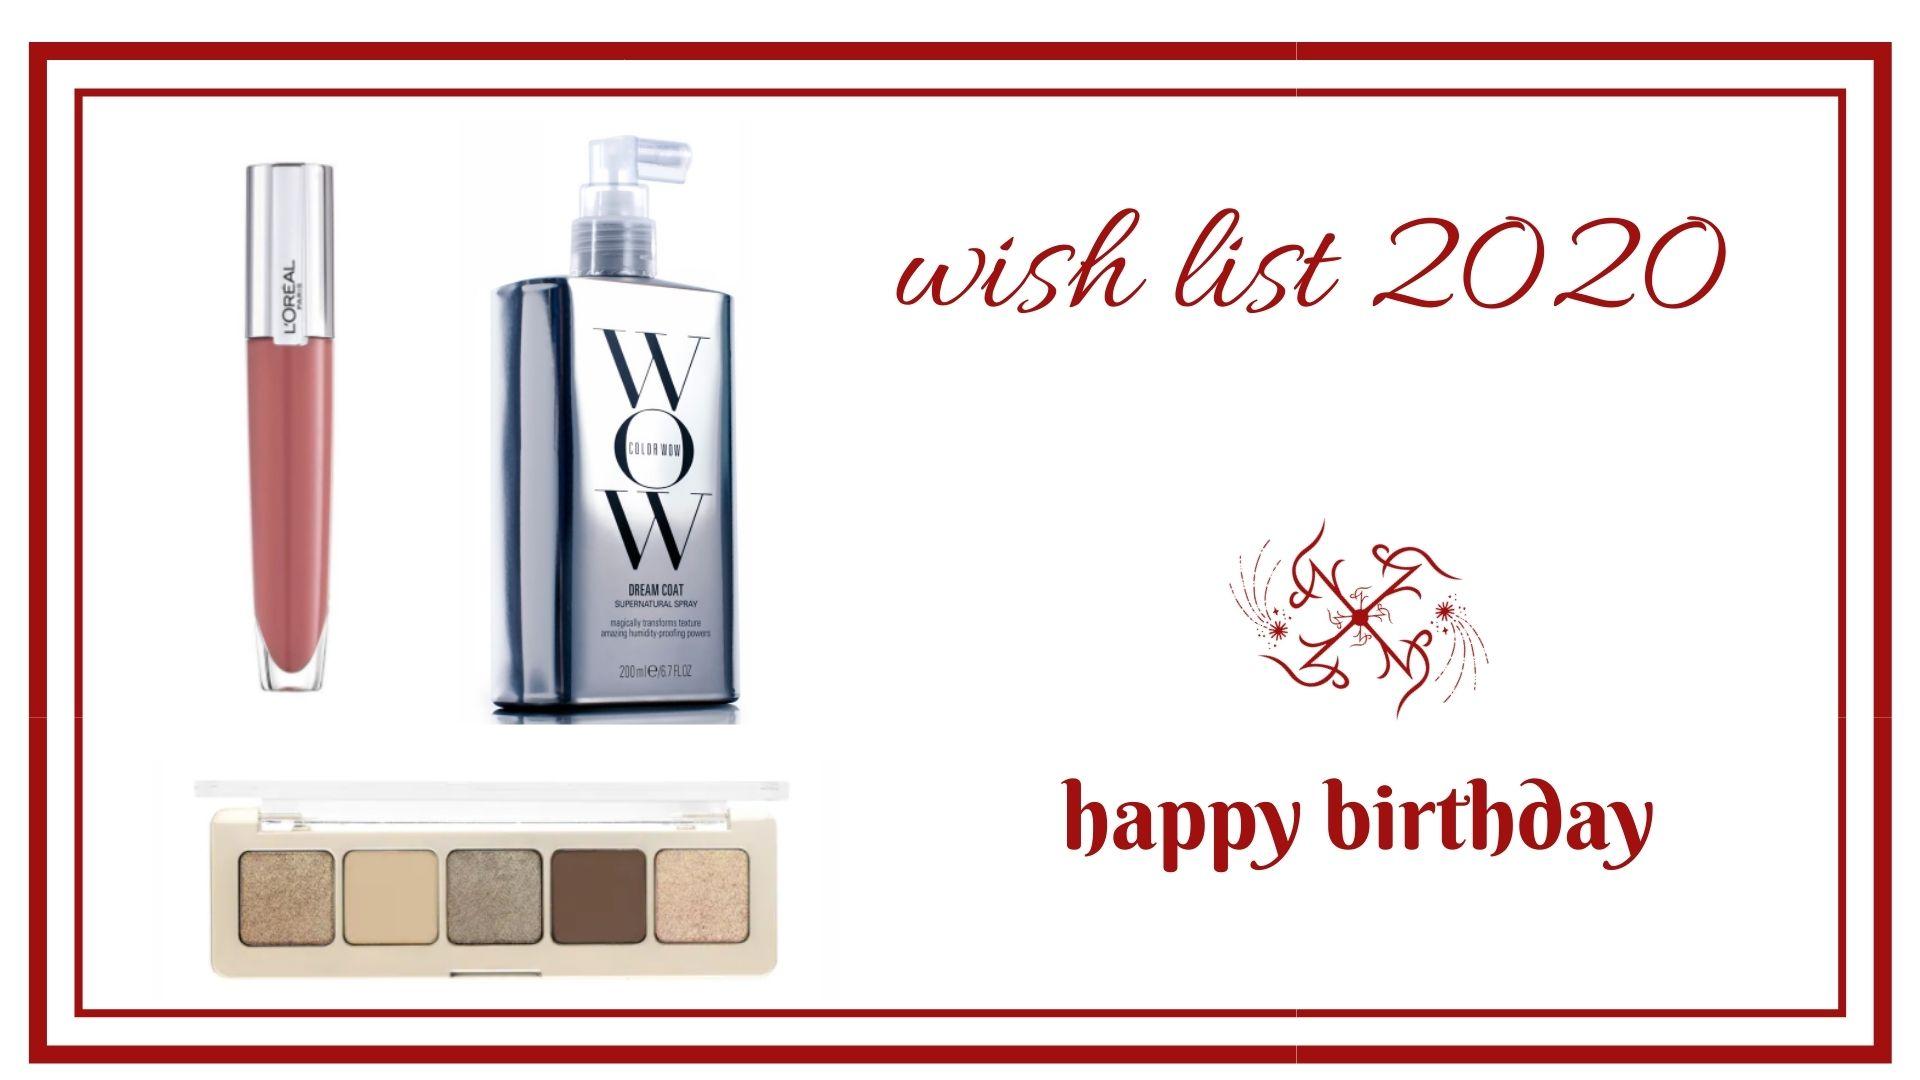 _BLOG frivole et Futile wish list 2020